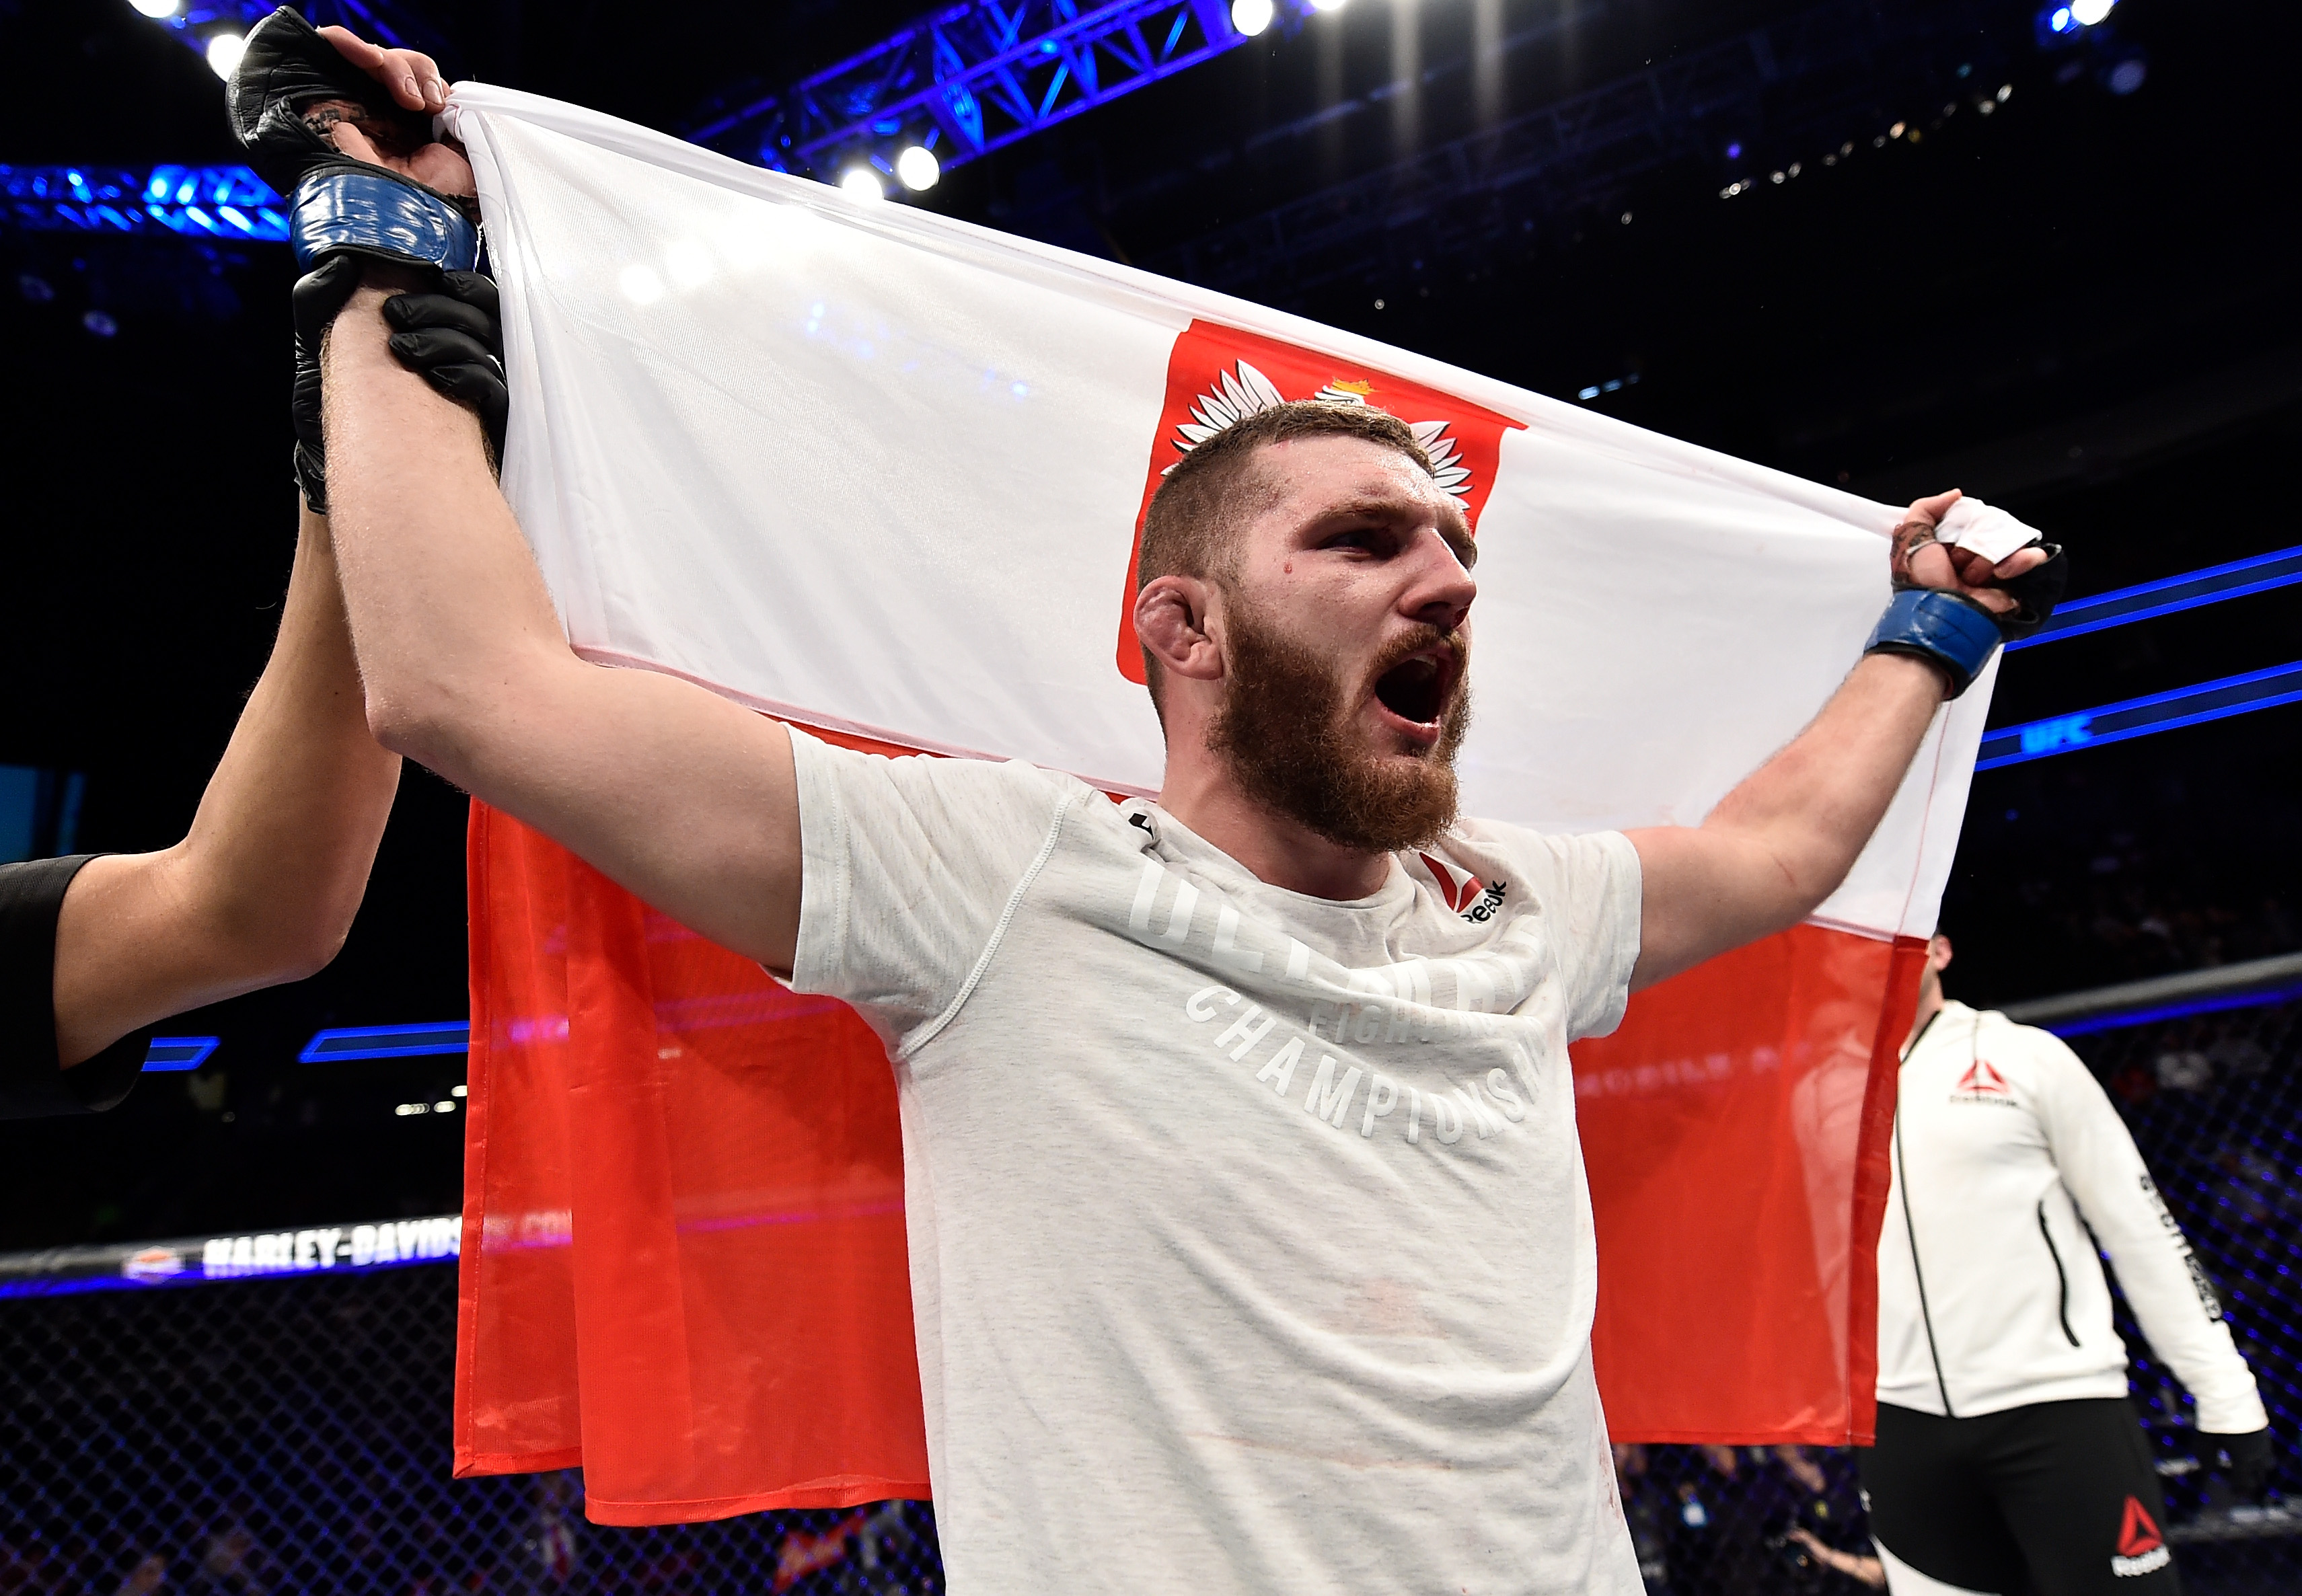 UFC 219: Rountree Jr. v Oleksiejczuk